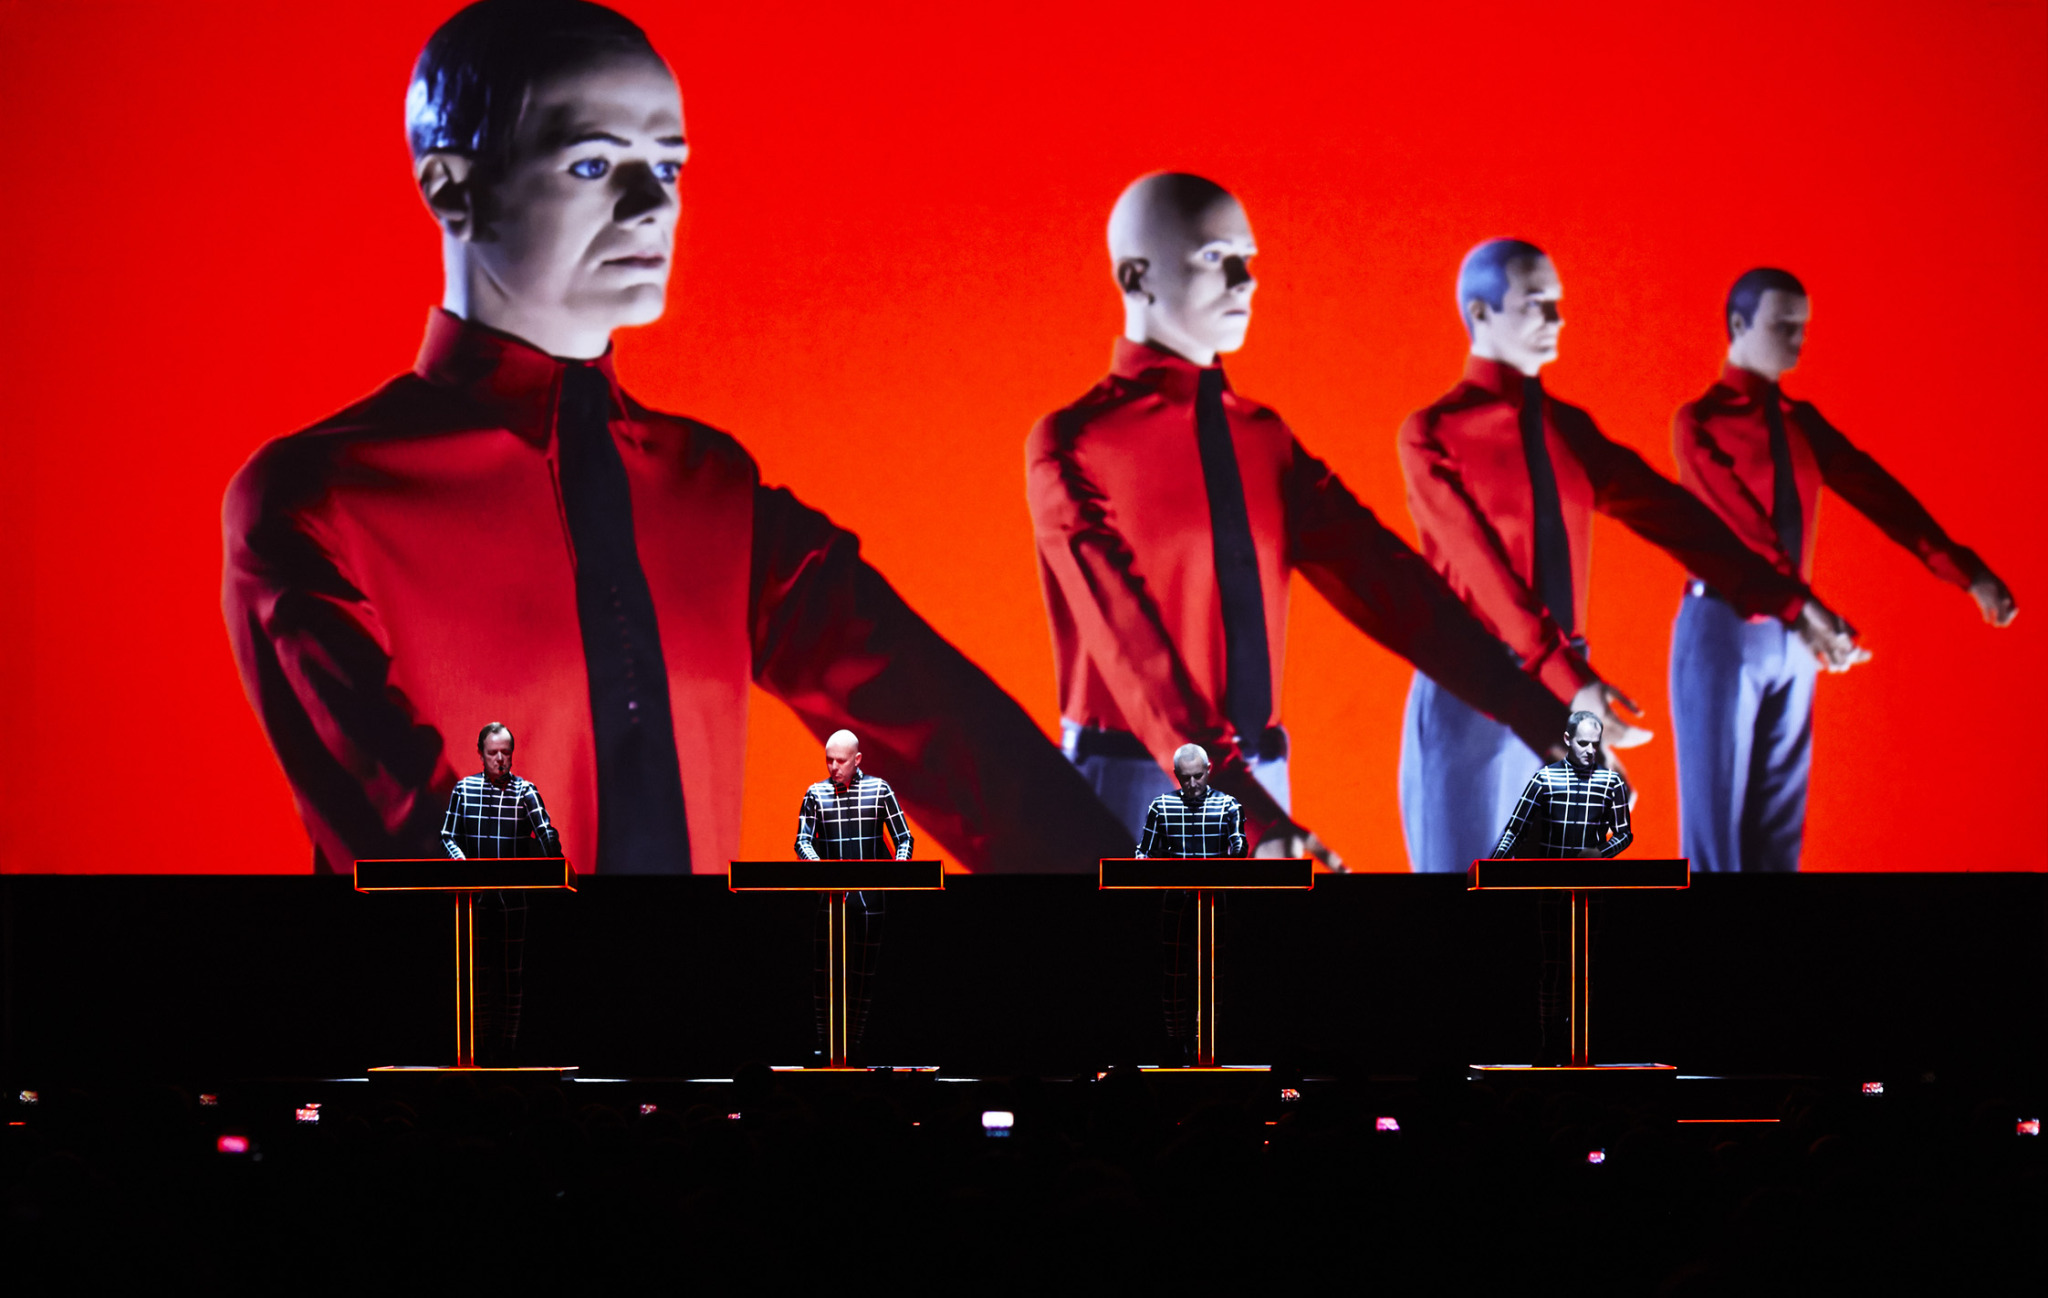 Kraftwerk on Cycling, 3D, 'Spiritual Connection' to ...Kraftwerk 3d